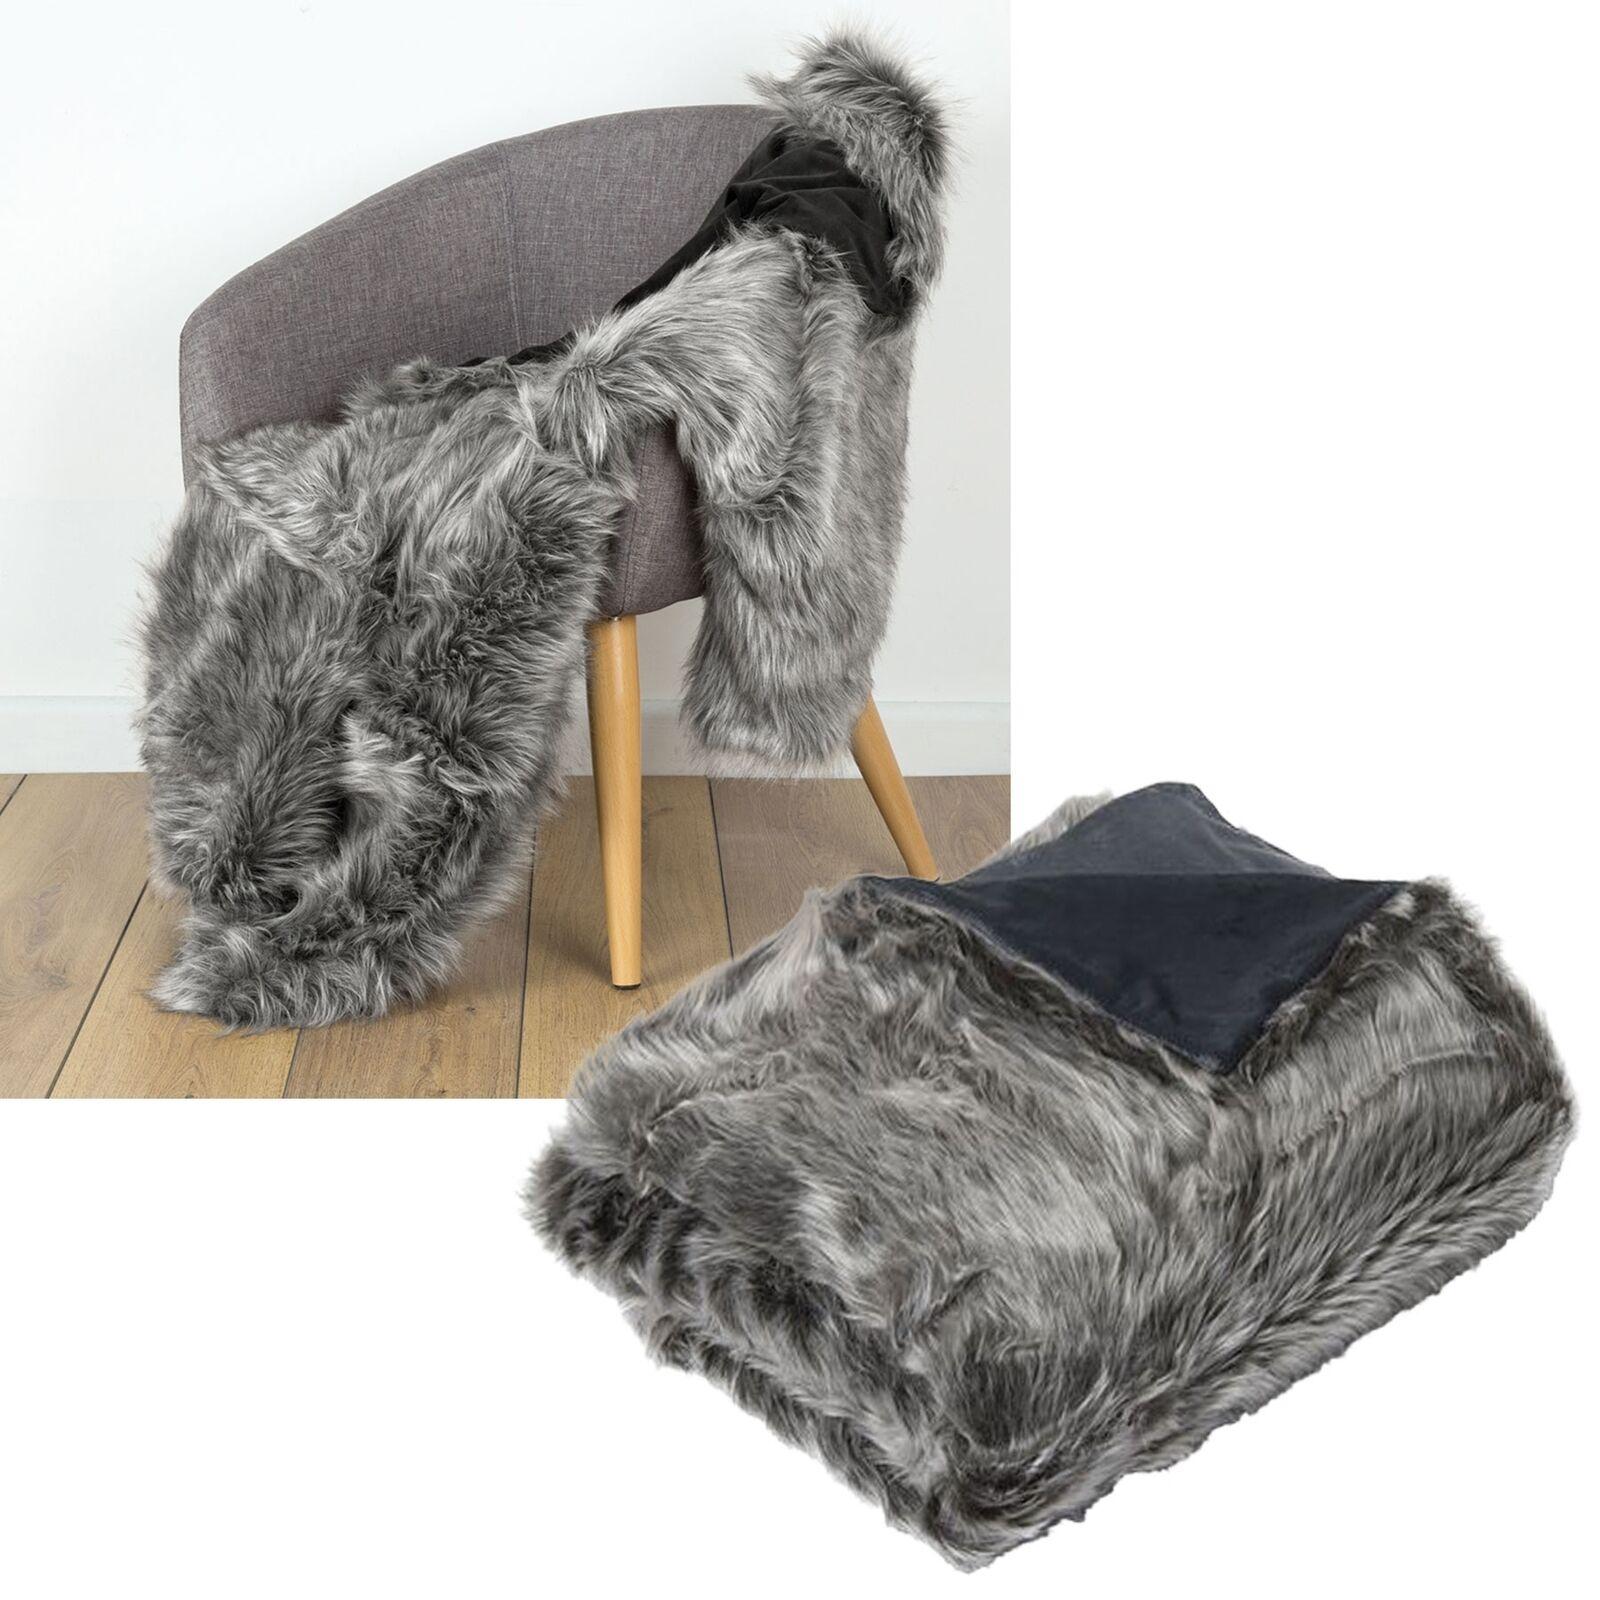 Luxury Soft Faux Fur Mink WOLF Bed Sofa Lounge Throw Blanket Runner 125x150cm